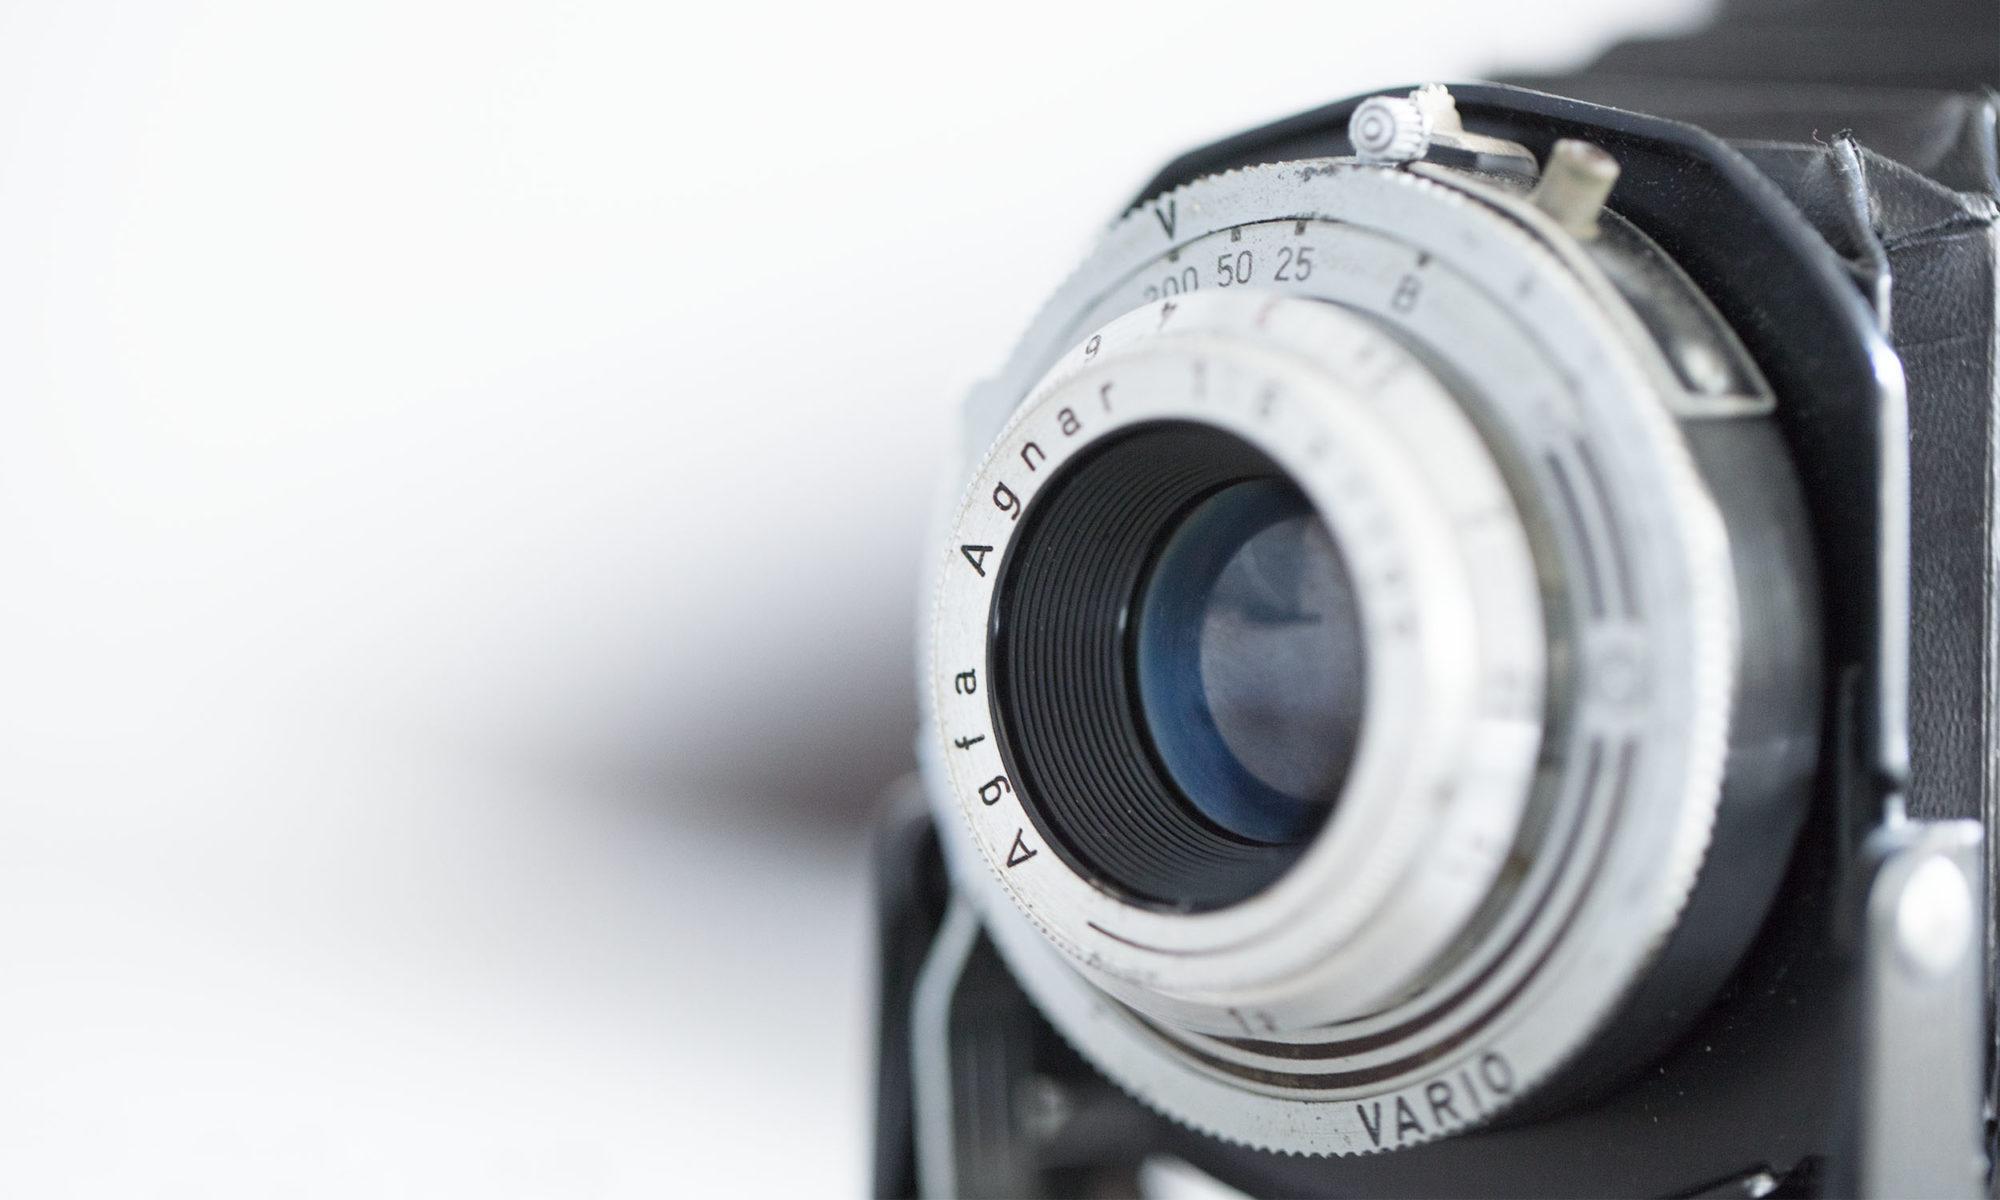 mike-dennis mueller, freier fotograf